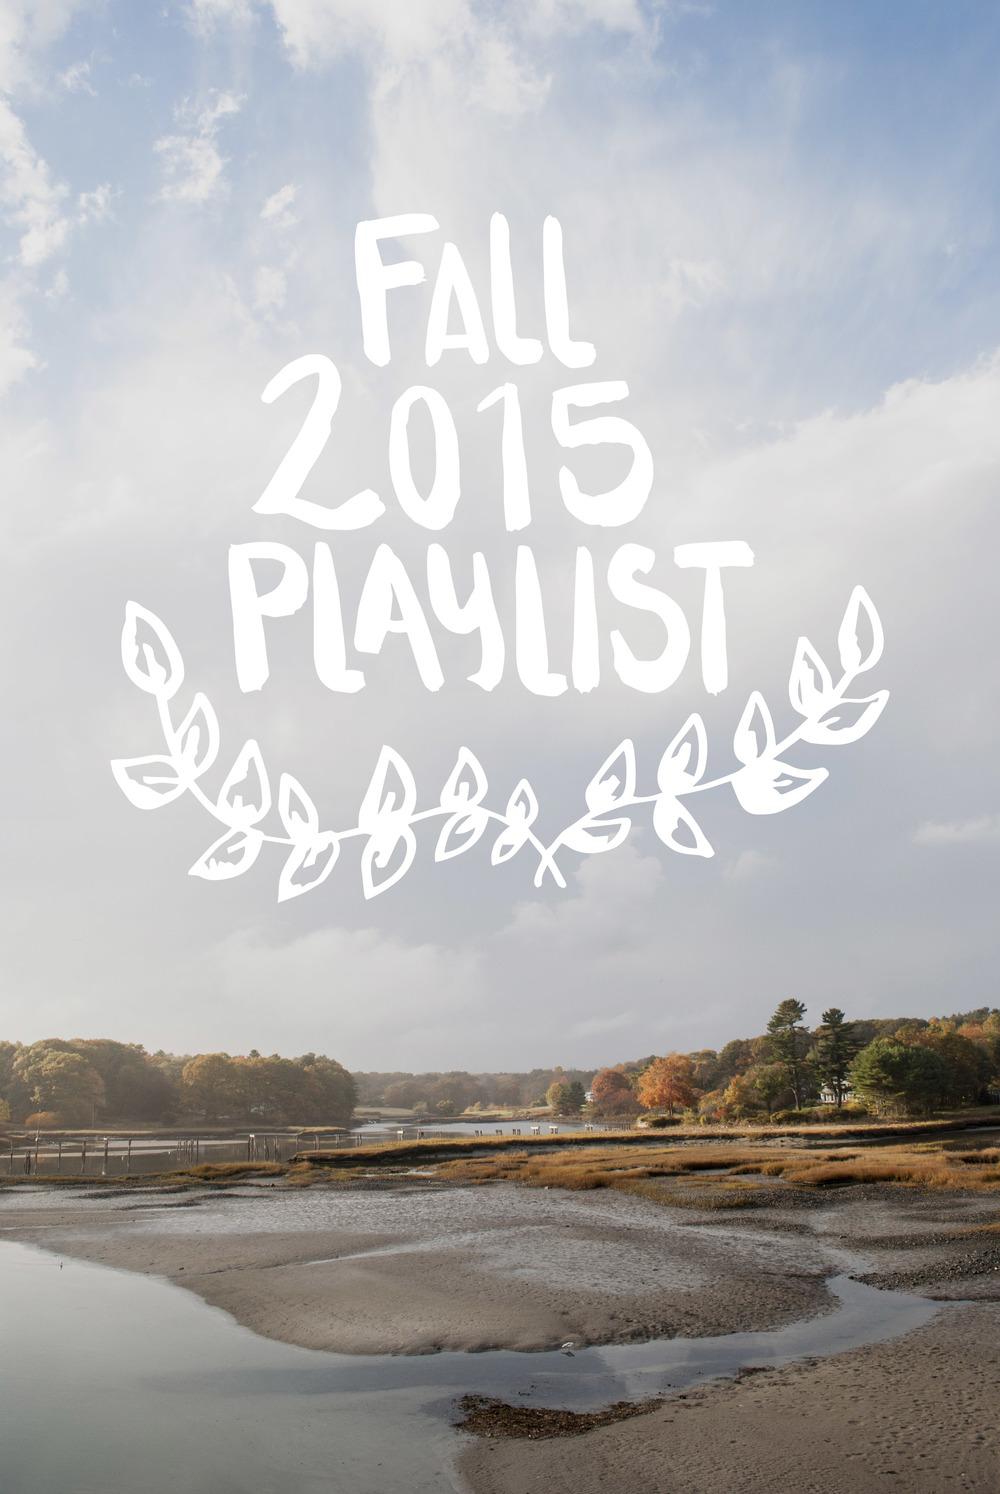 SOA_fall-playlist-2015.jpg